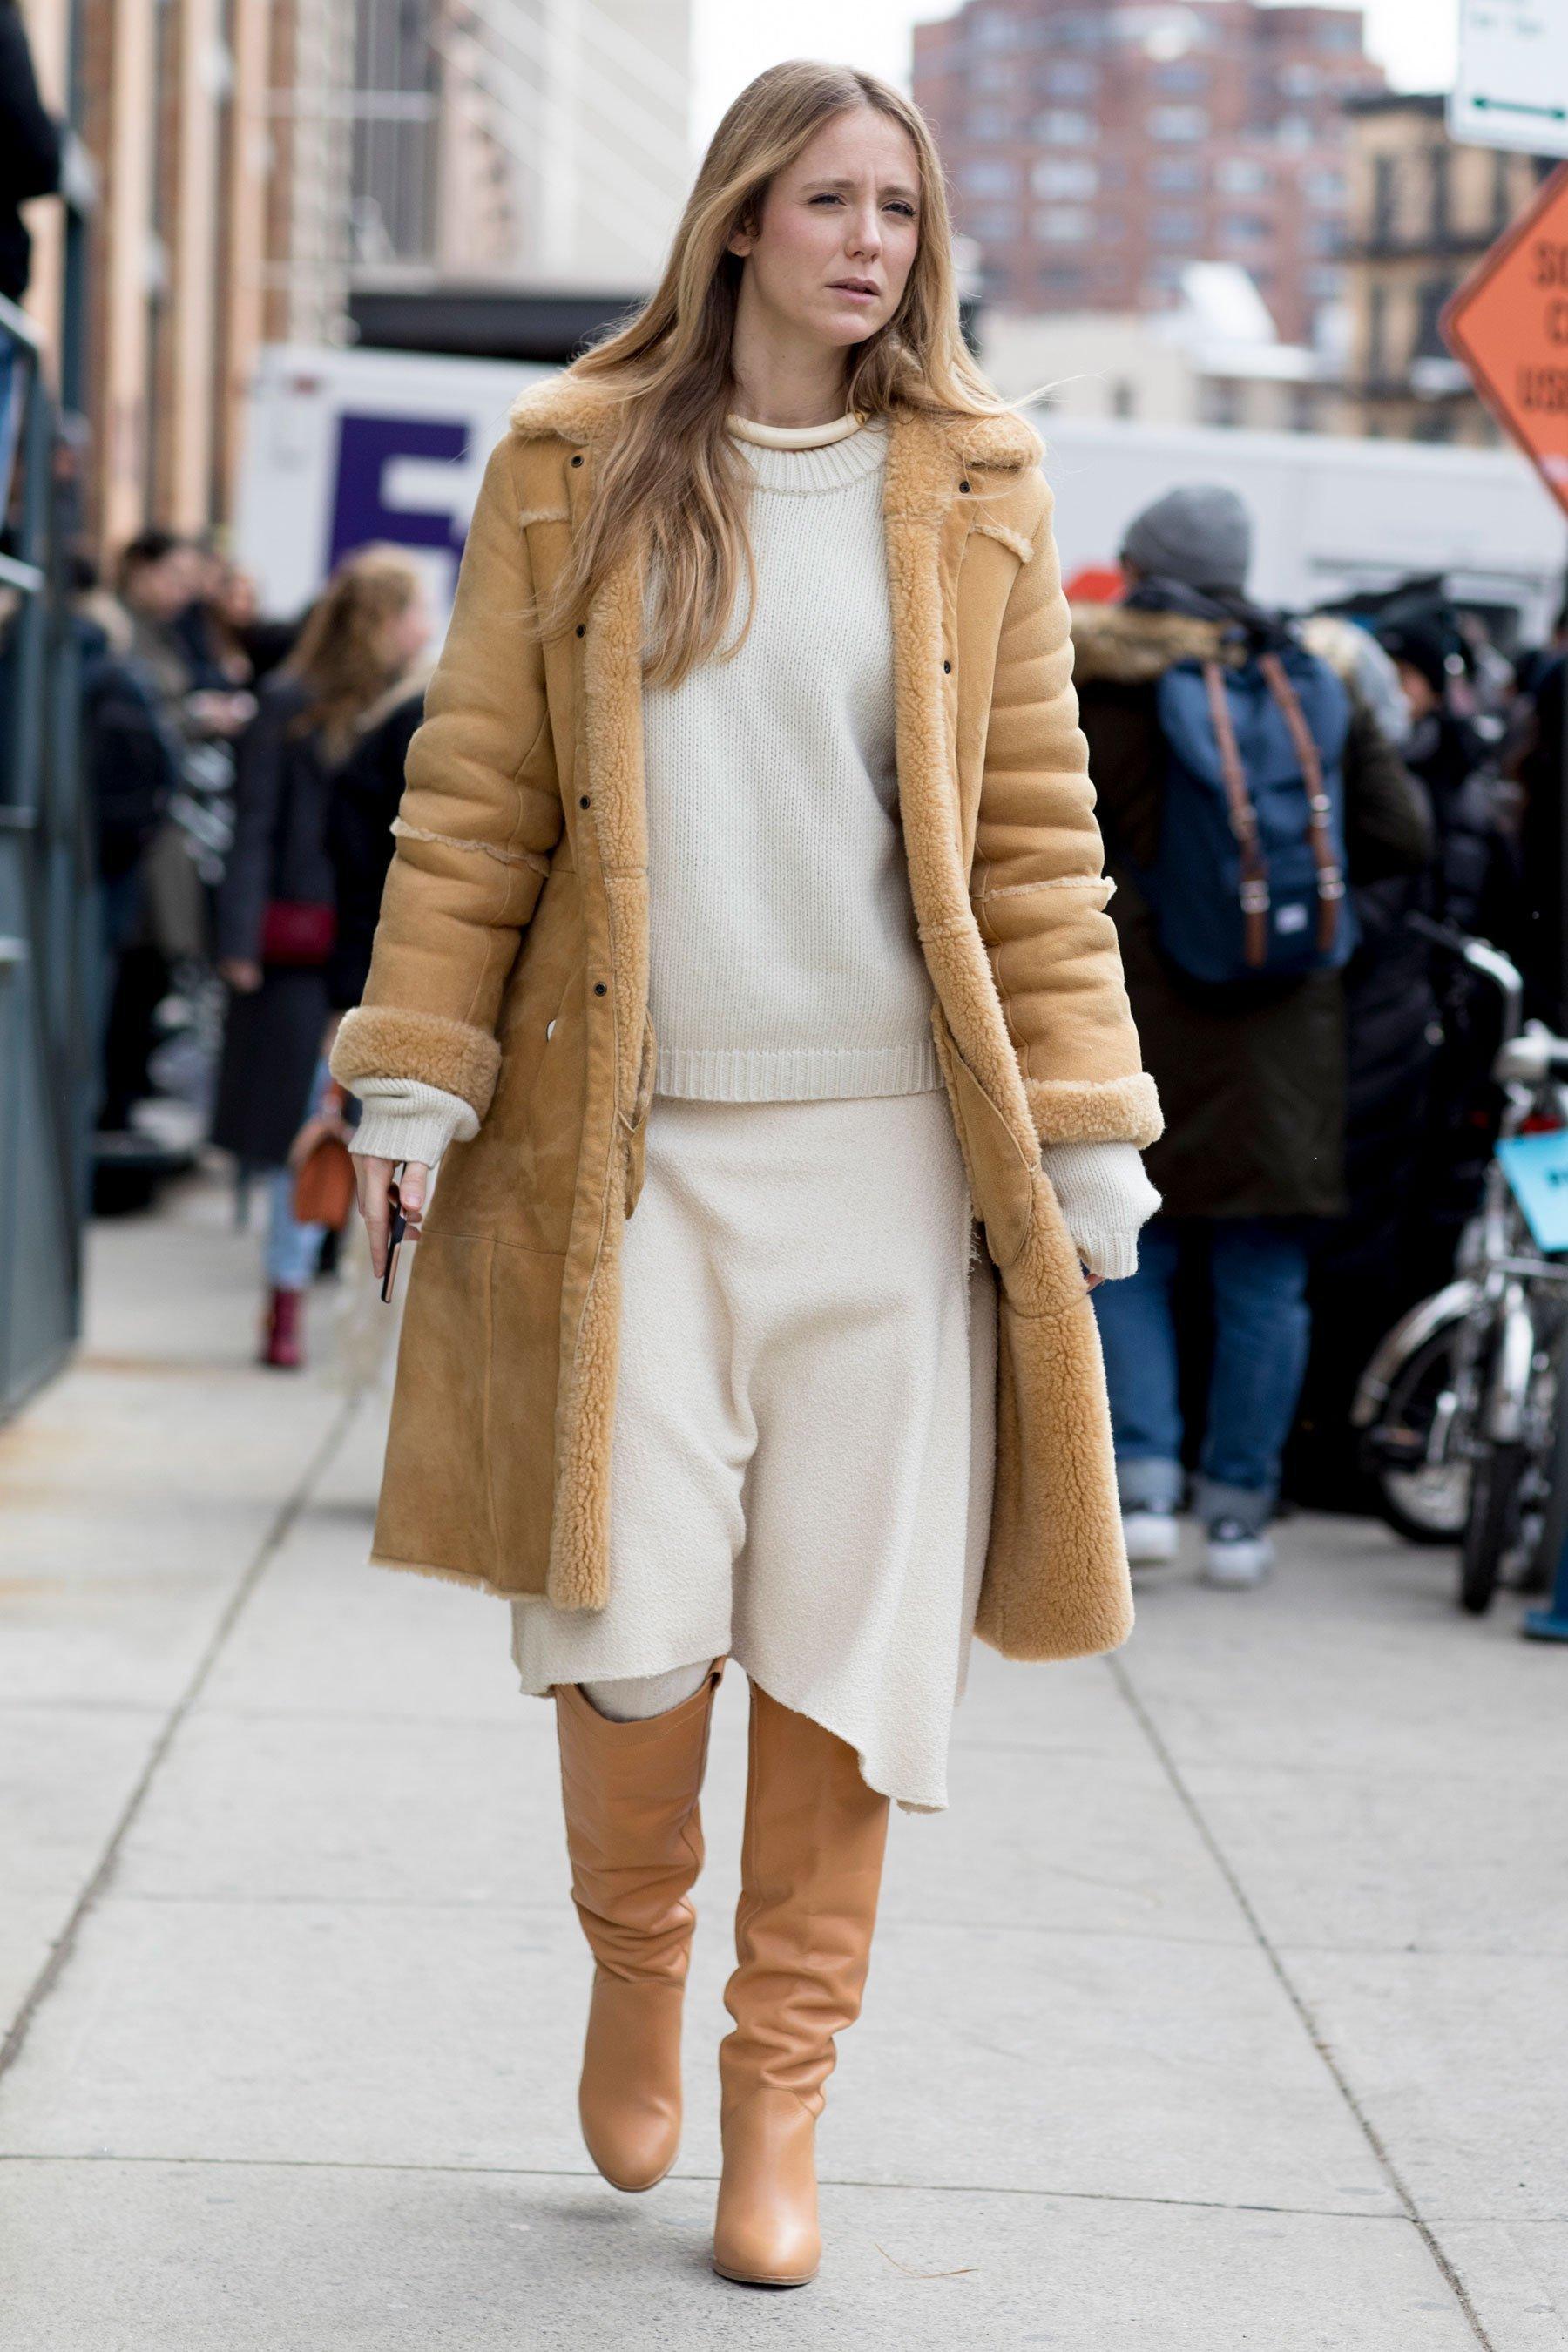 Women's Tan Shearling Coat, White Crew-neck Sweater, White Wool Midi Skirt,  Tan Leather Knee High Boots | Women's Fashion